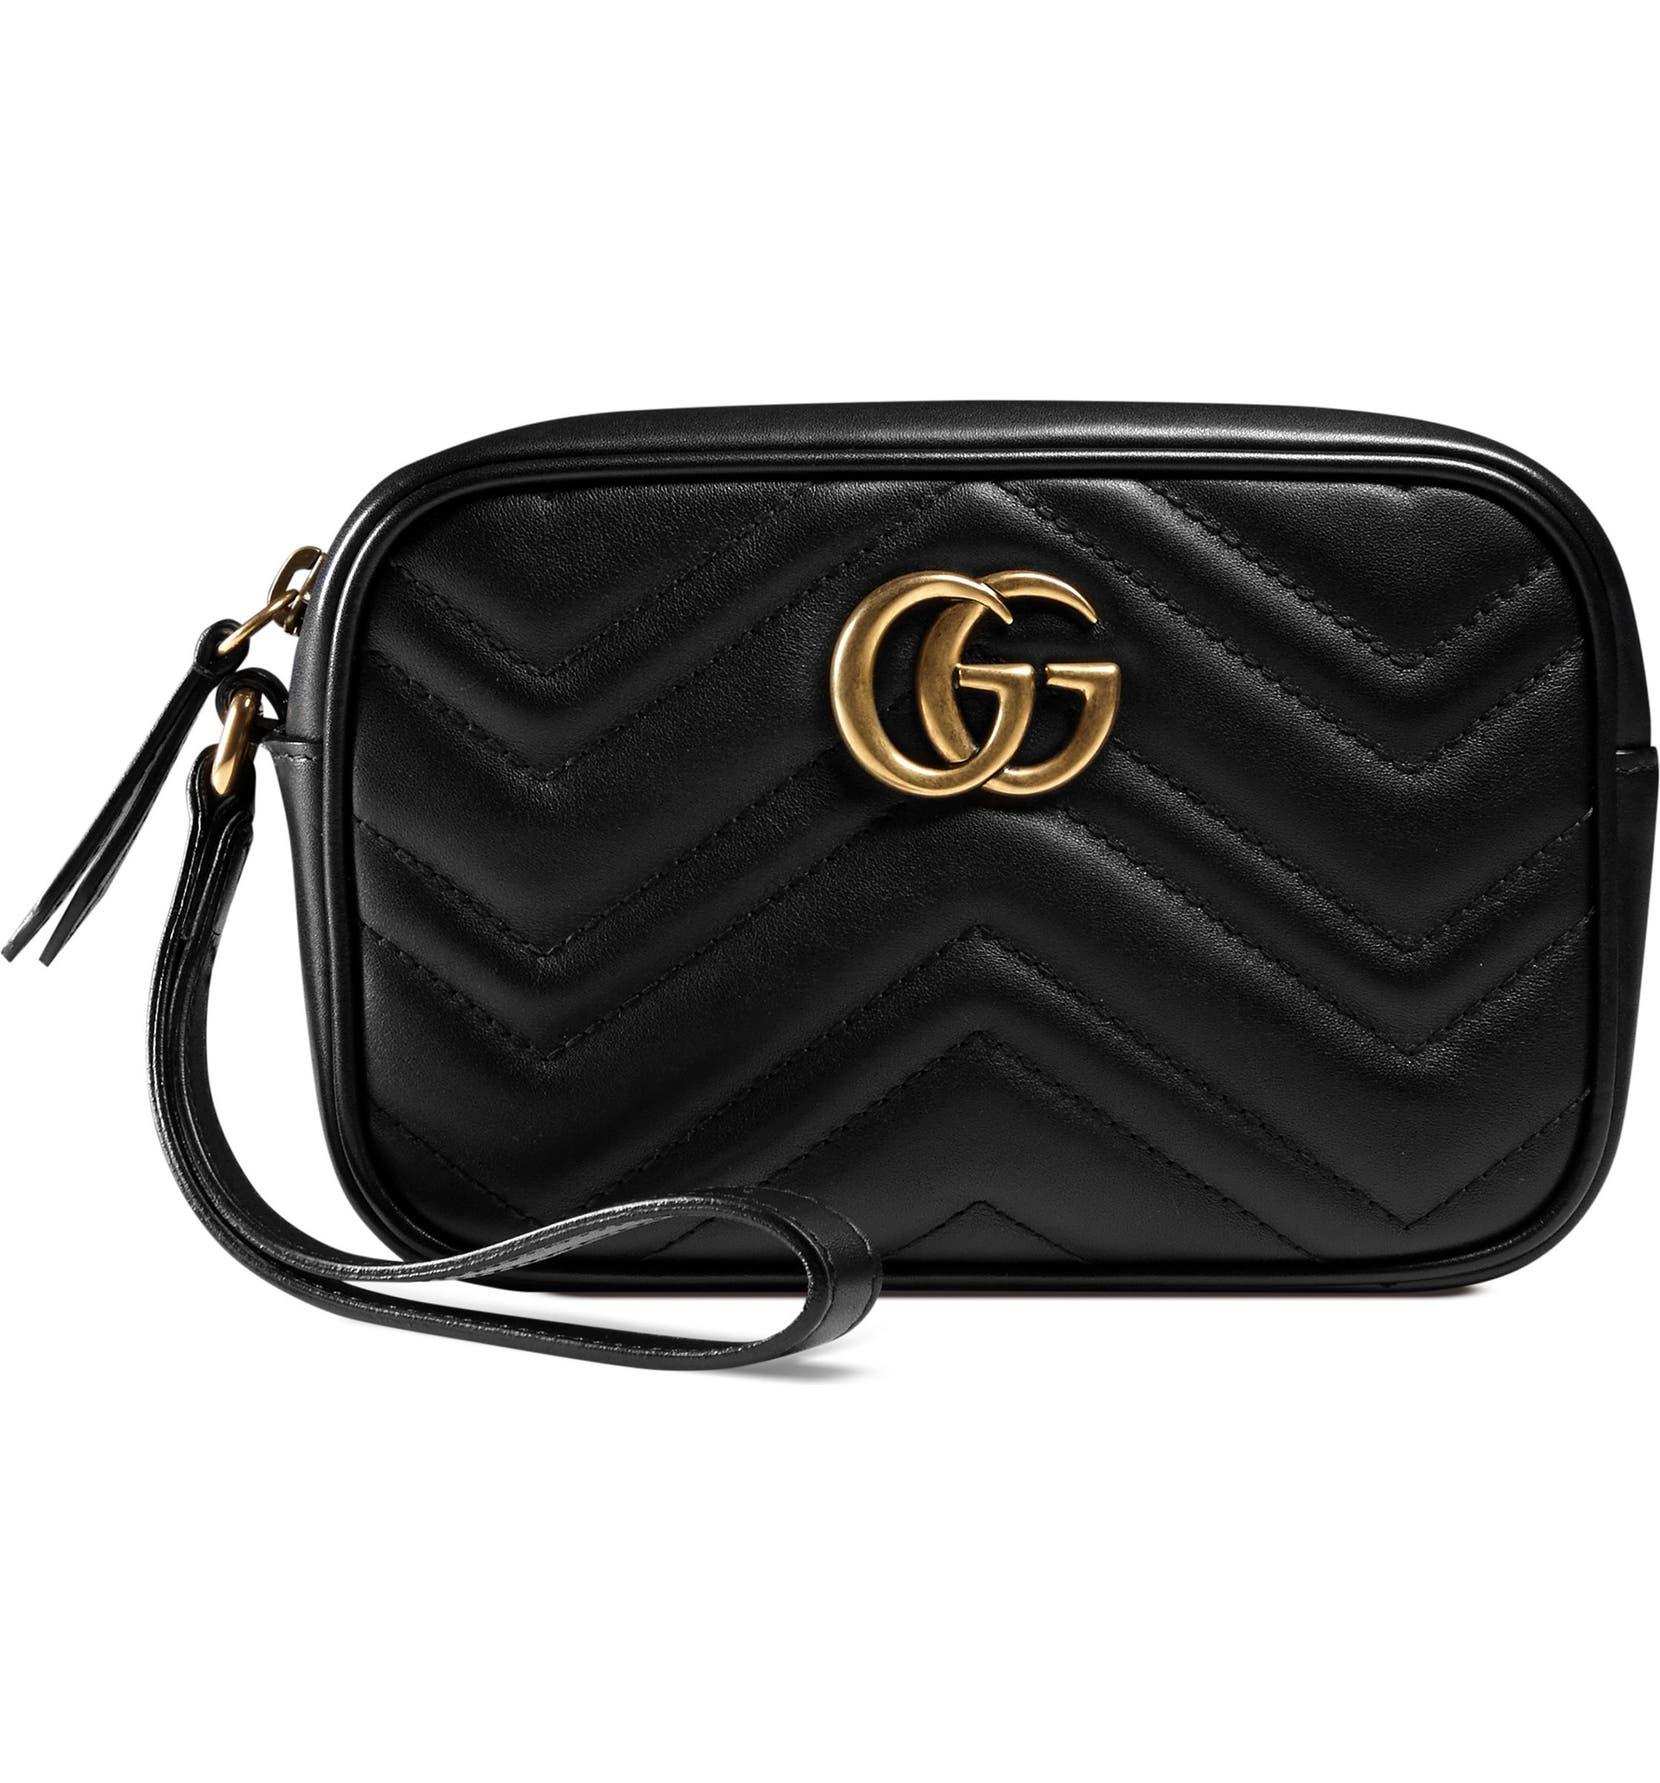 881e726c40eb Gucci GG Marmont Matelassé Imitation Pearl Leather Shoulder Bag | Nordstrom